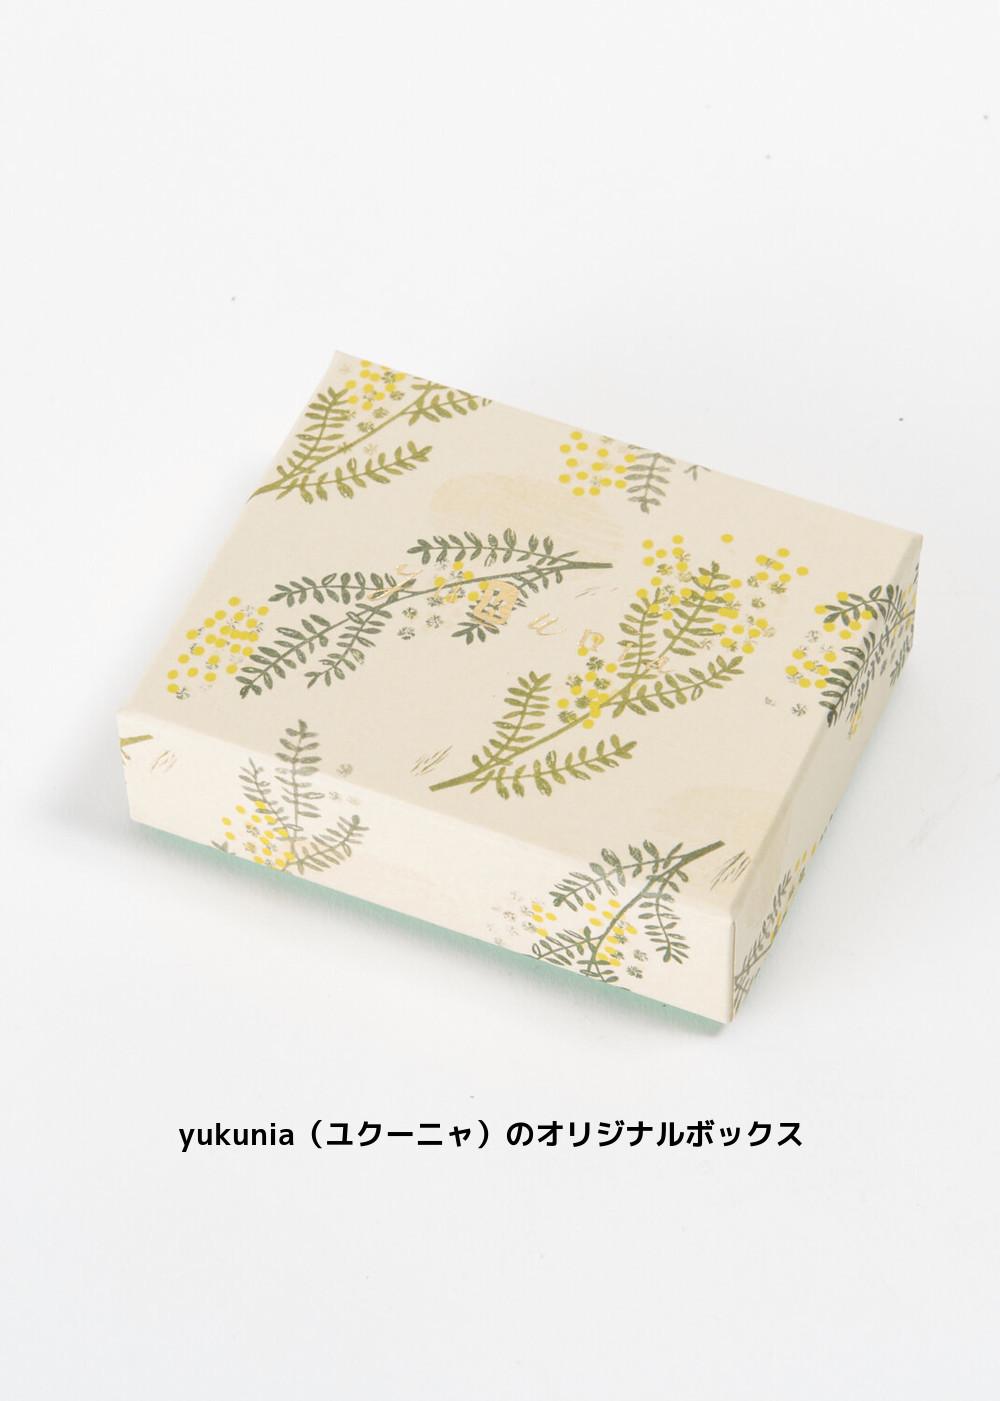 【yukunia】ユクーニャの『切手シリーズ』アベンチュリン